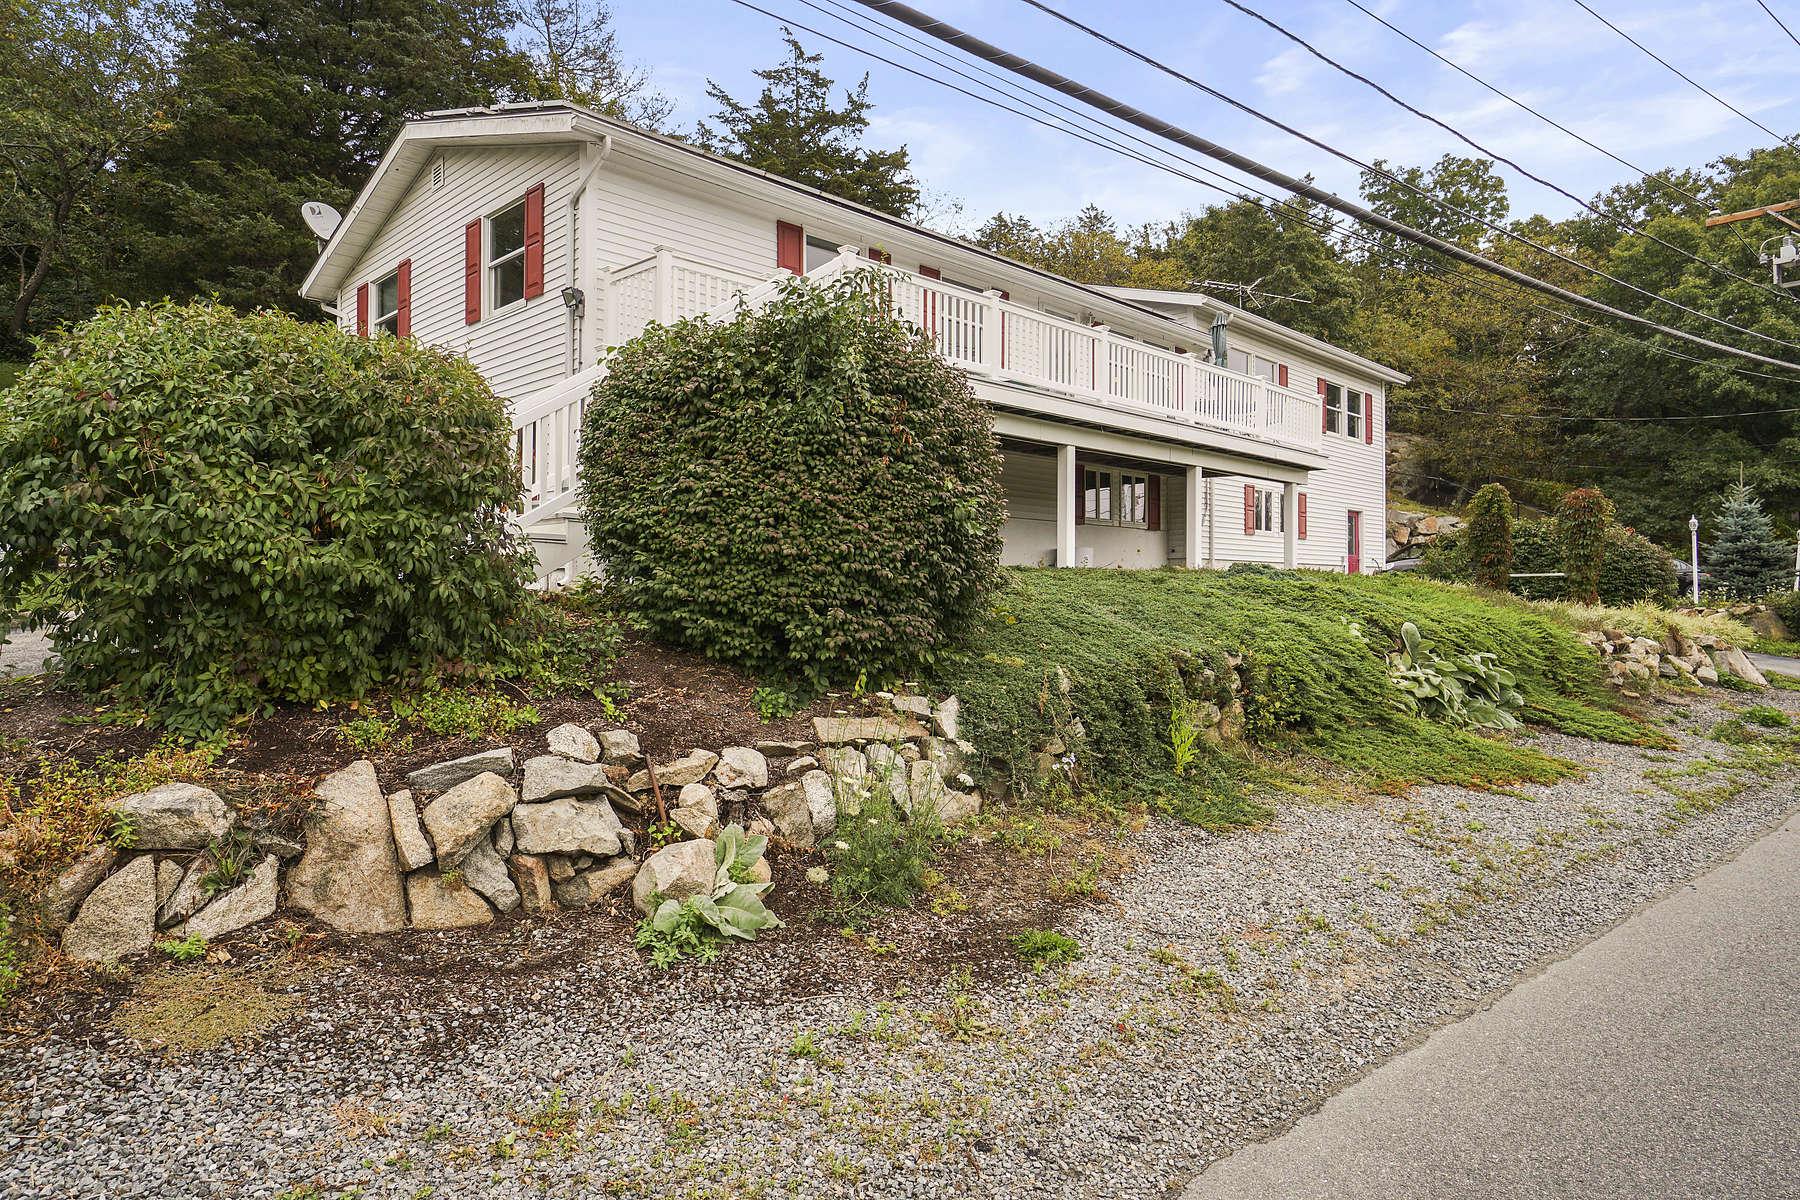 Single Family Homes for Sale at 37 Atlantic Ave Gloucester, Massachusetts 01930 United States